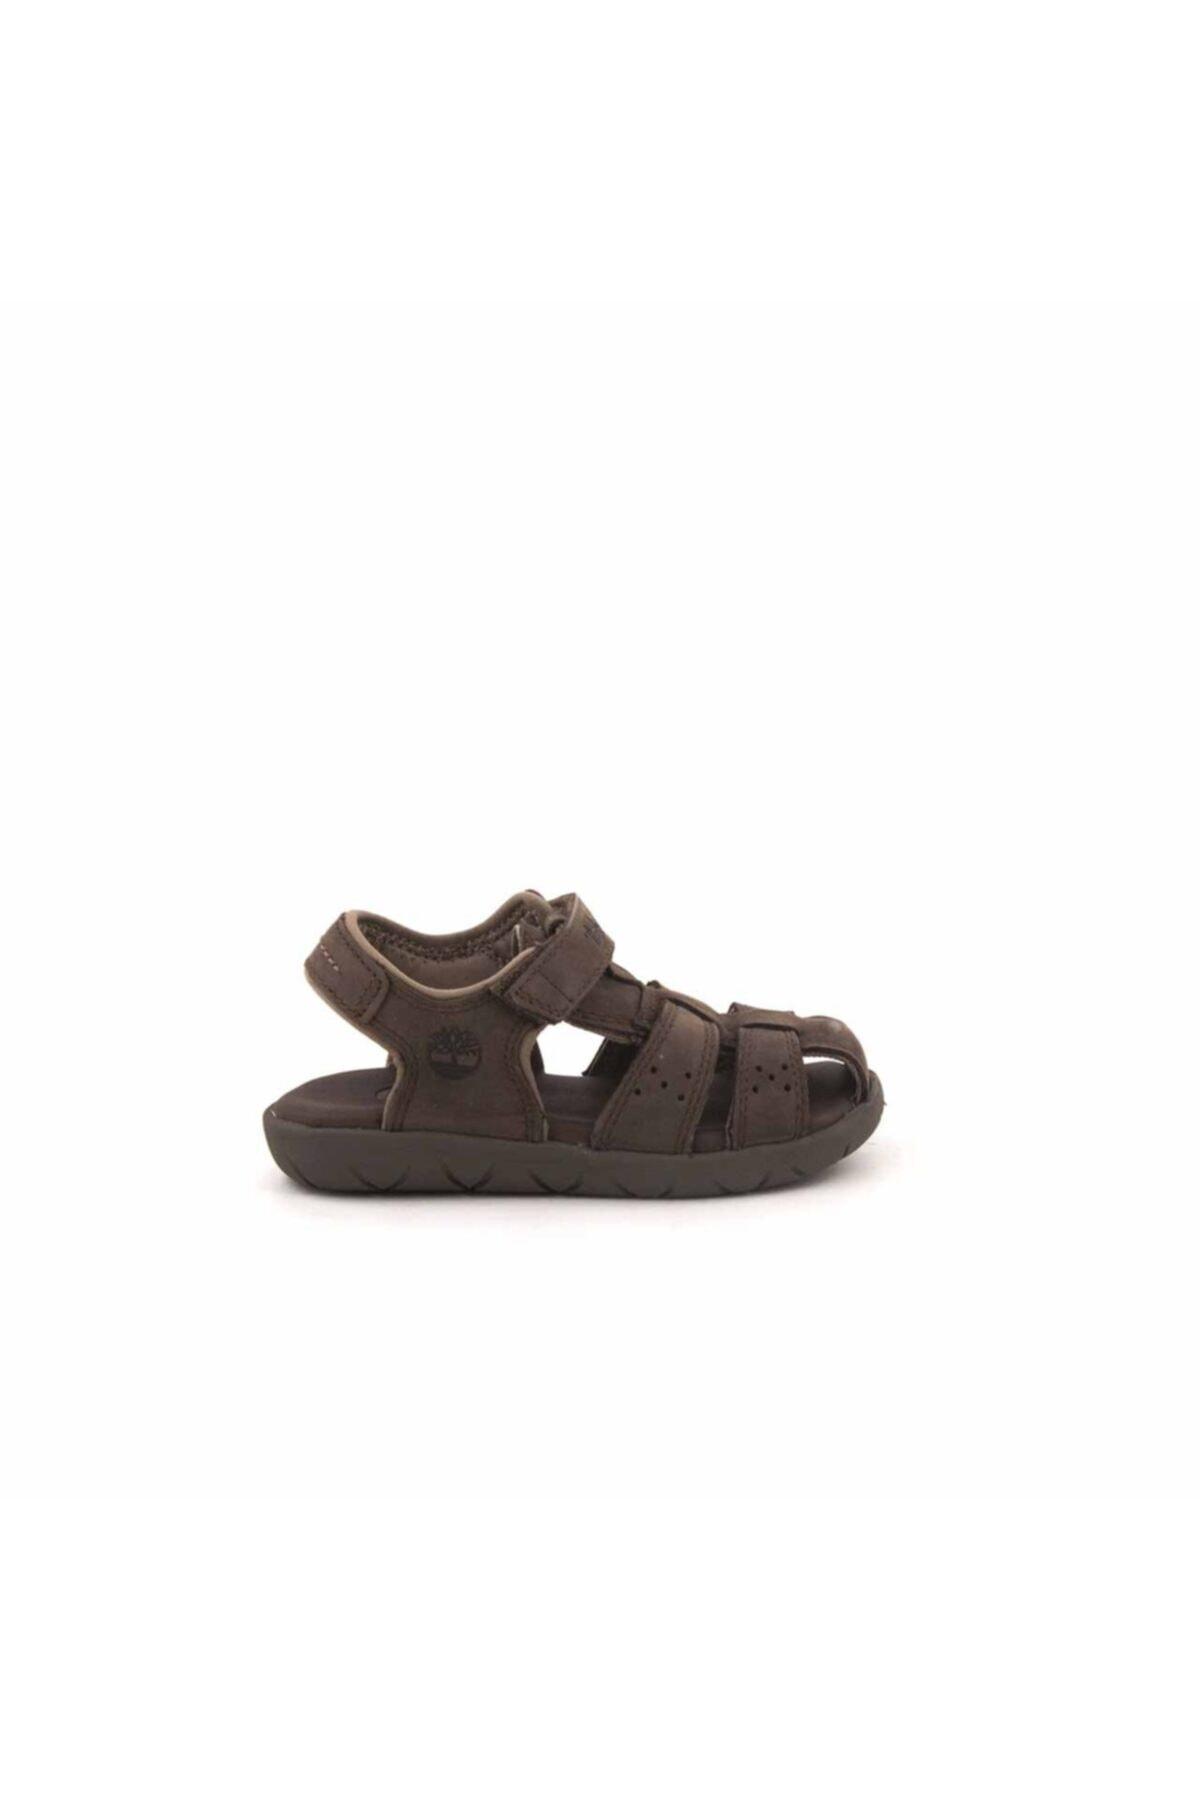 Timberland Erkek Çocuk Sandalet Tb0a24wed541 1